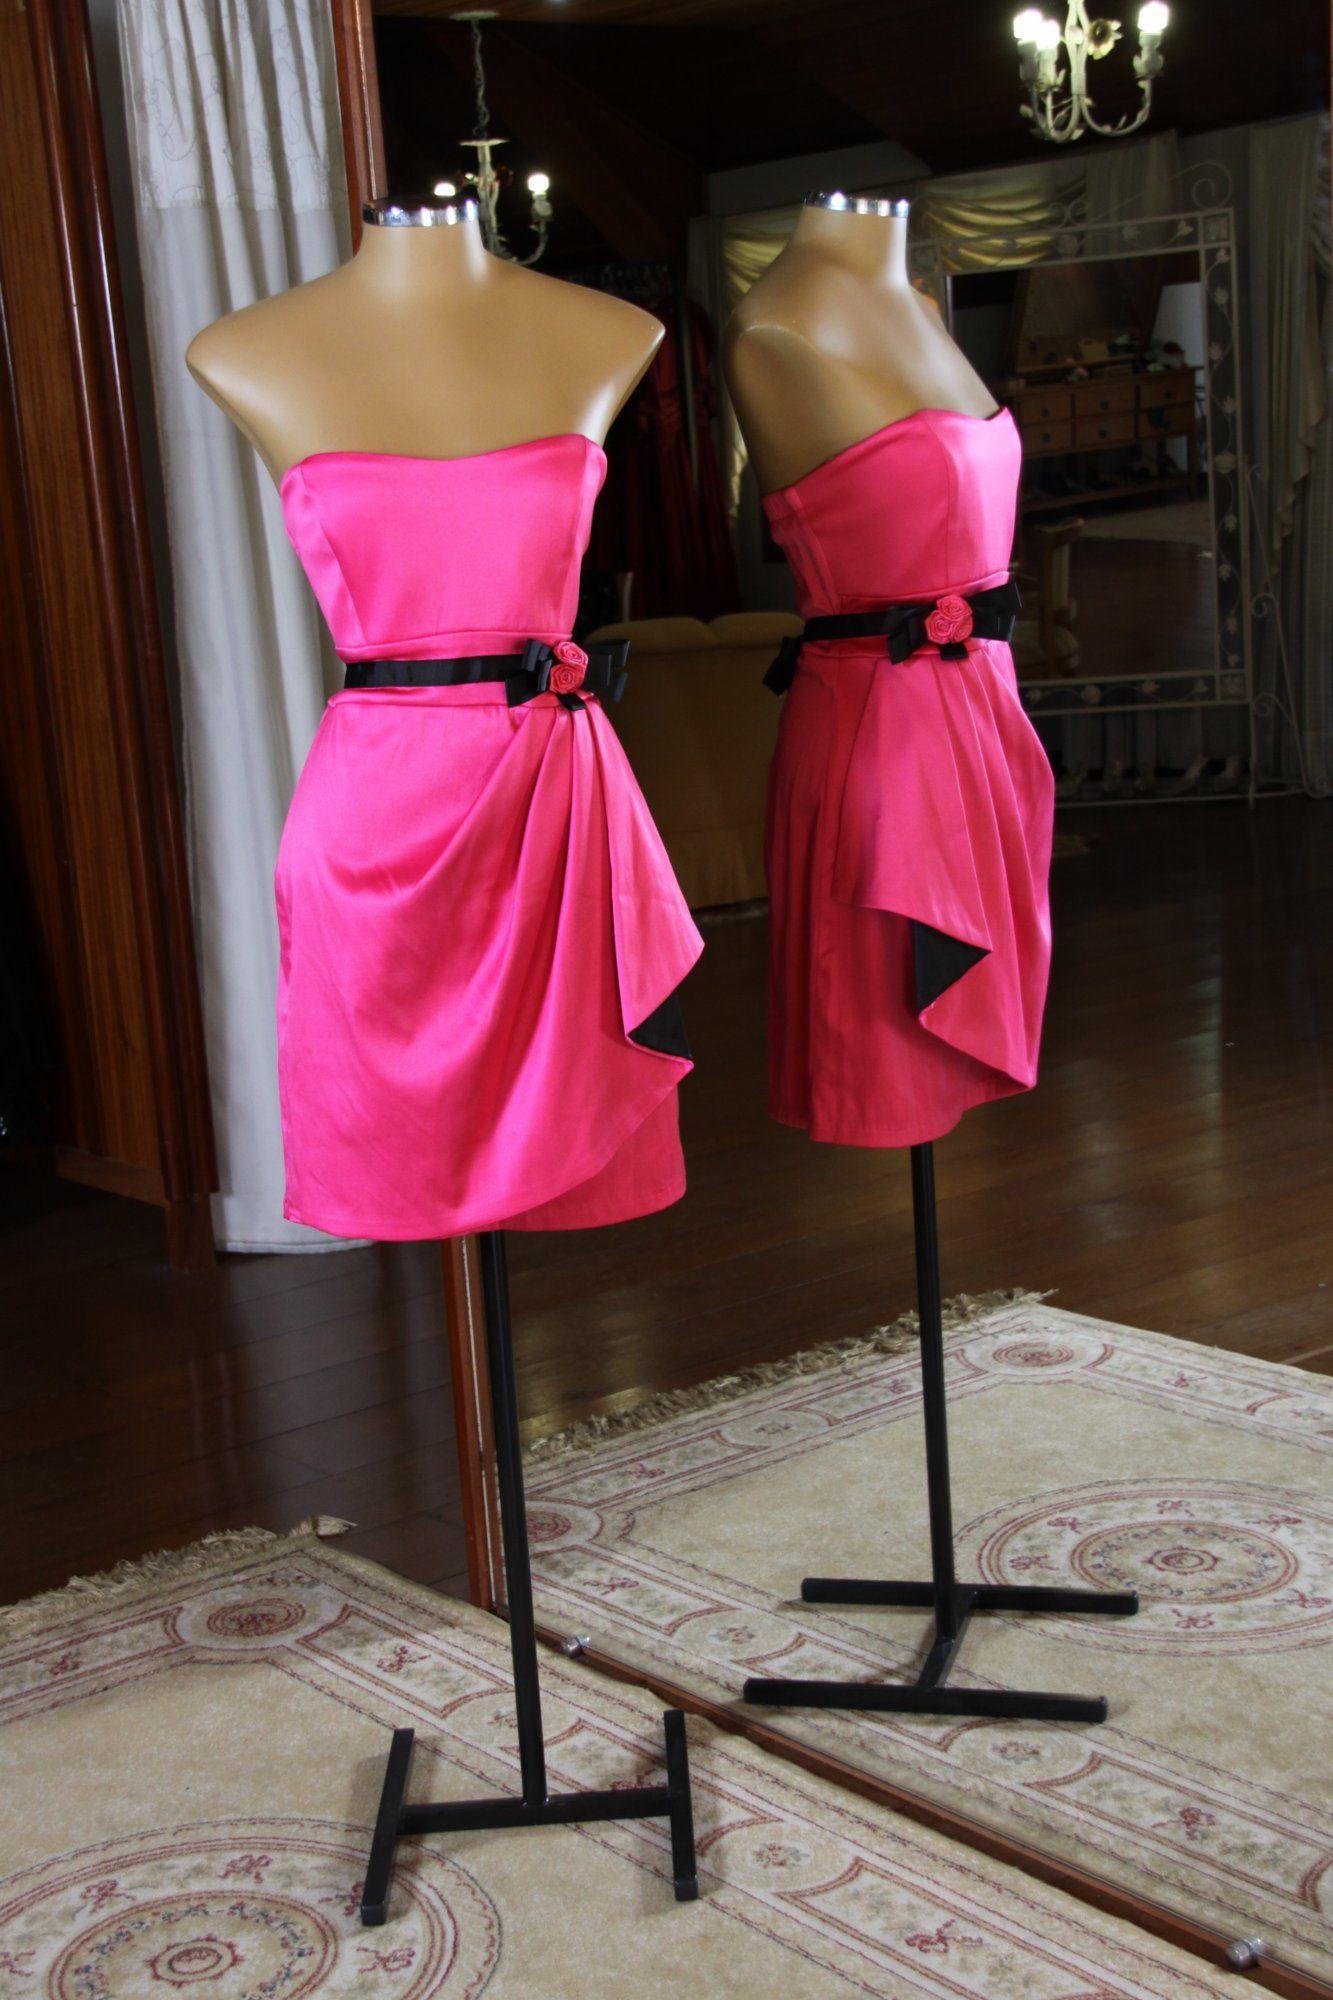 Vestido de Debutante Pink - 22 - Hipnose Alta Costura e Spa para Noivas e Noivos - Campinas - SP Vestido de Debutante, Vestido de Debutante Pink, Hipnose Alta Costura